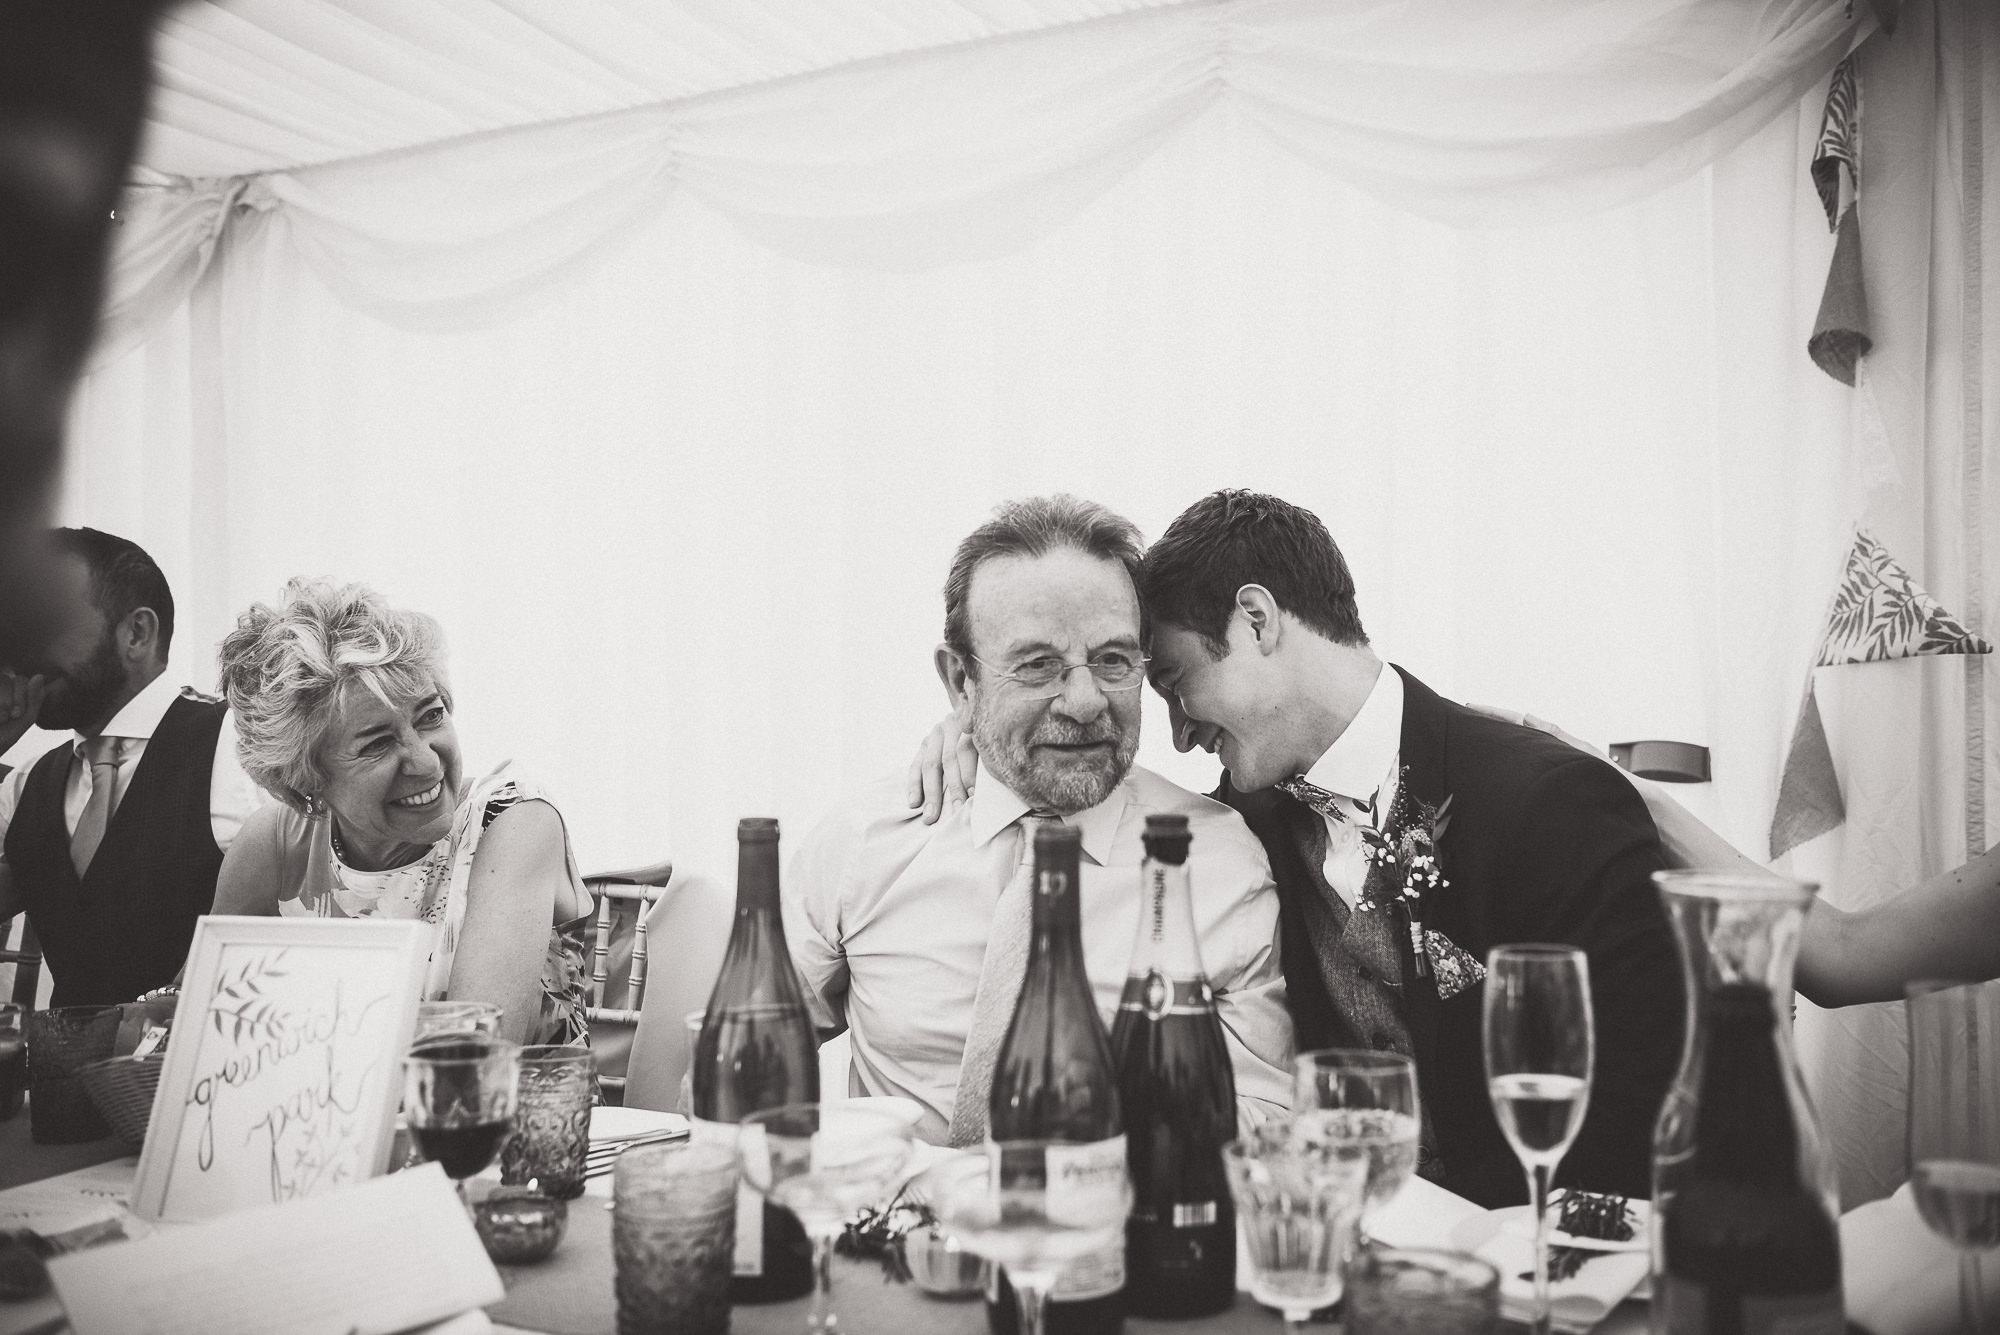 Veils & Bales Wedding Photography | Charlie & Steve SCSS 205